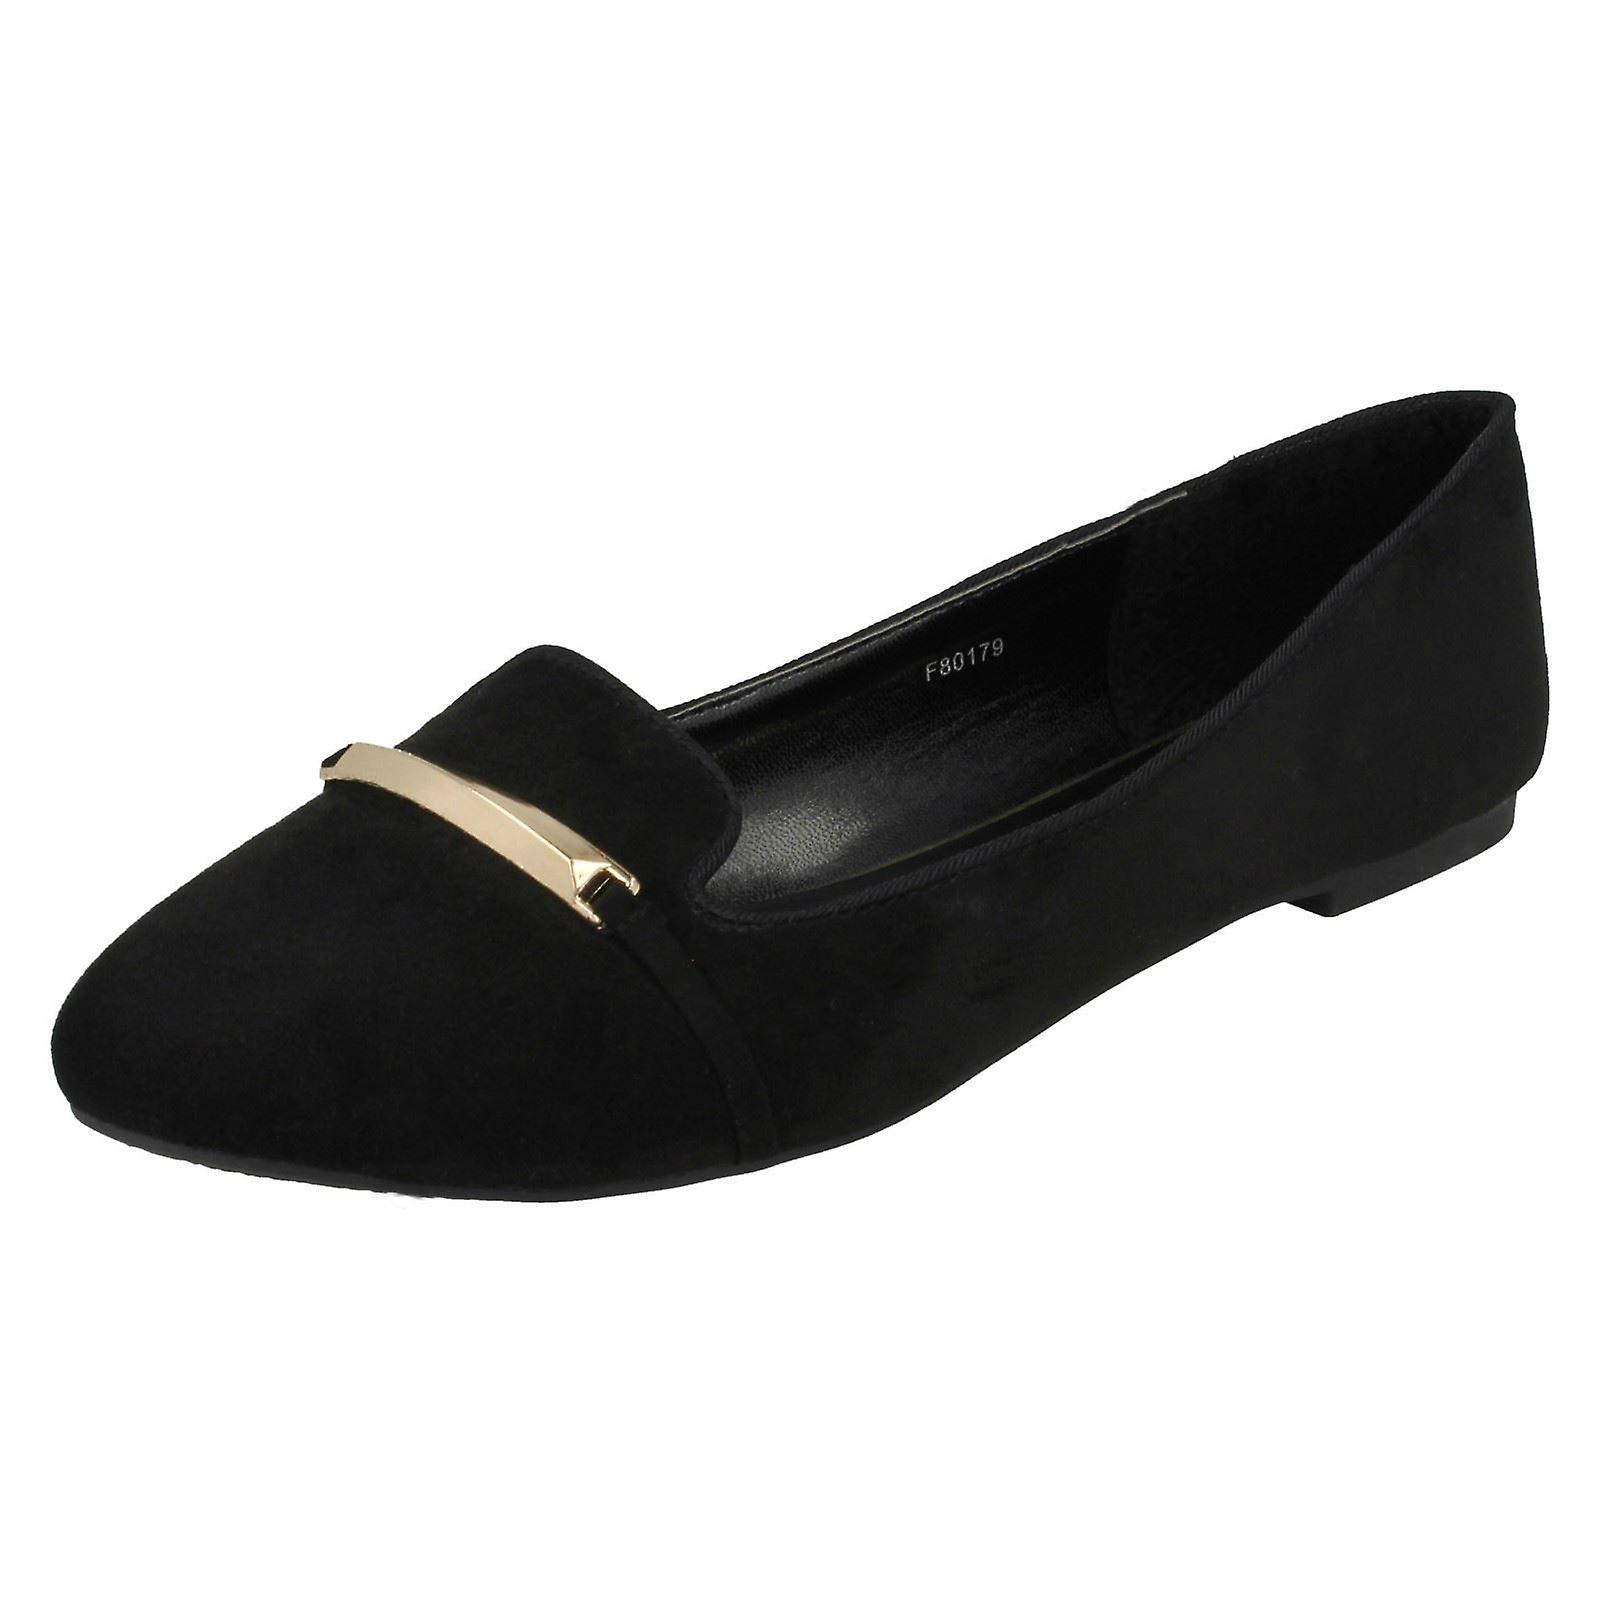 Damen-Spot auf Loafer Schuhe F80179